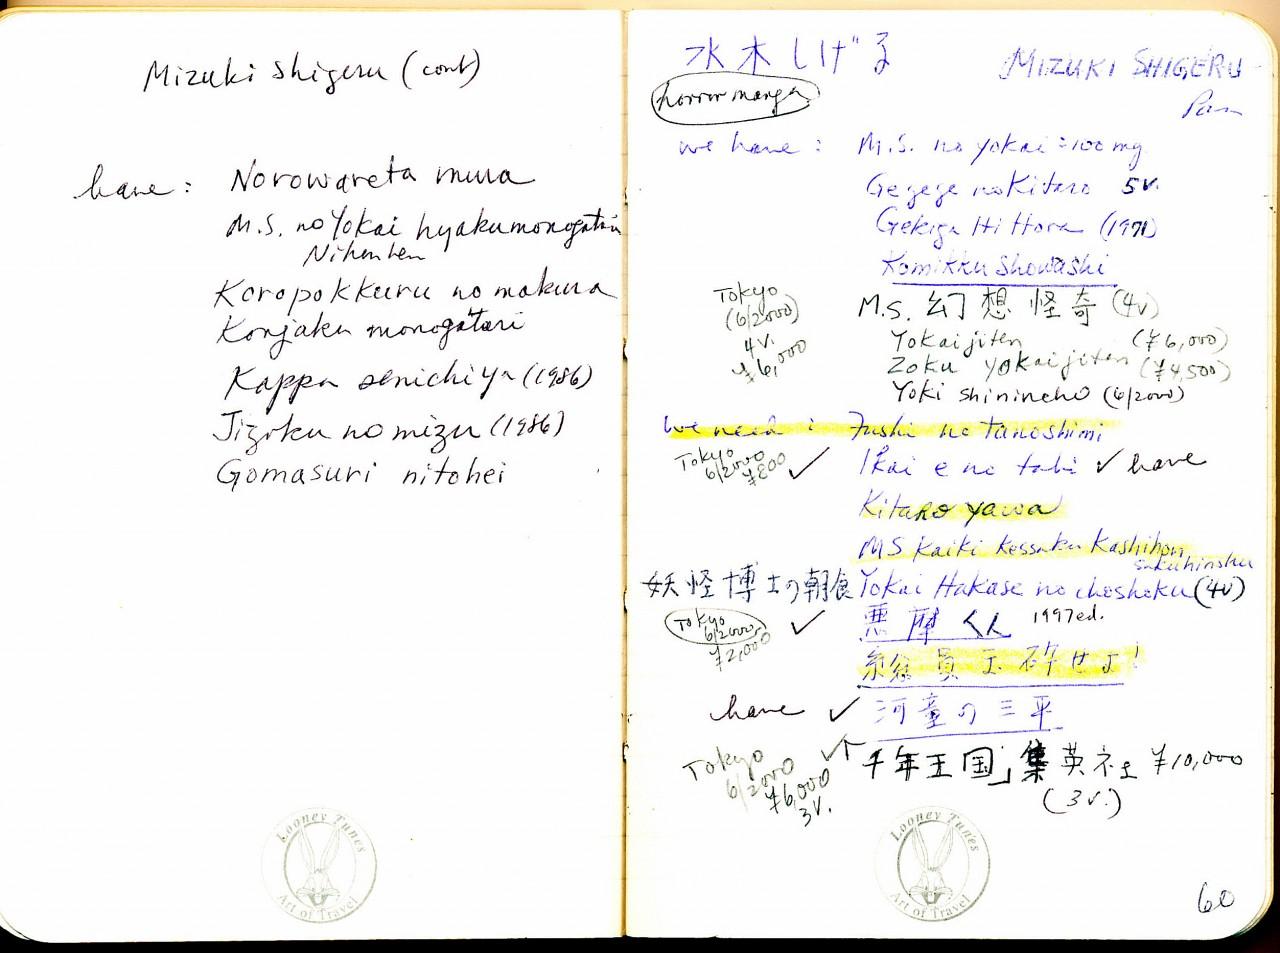 Maureen's notebook from June, 2000- shows purchases she made in Tokyo of Mizuki Shigeru.